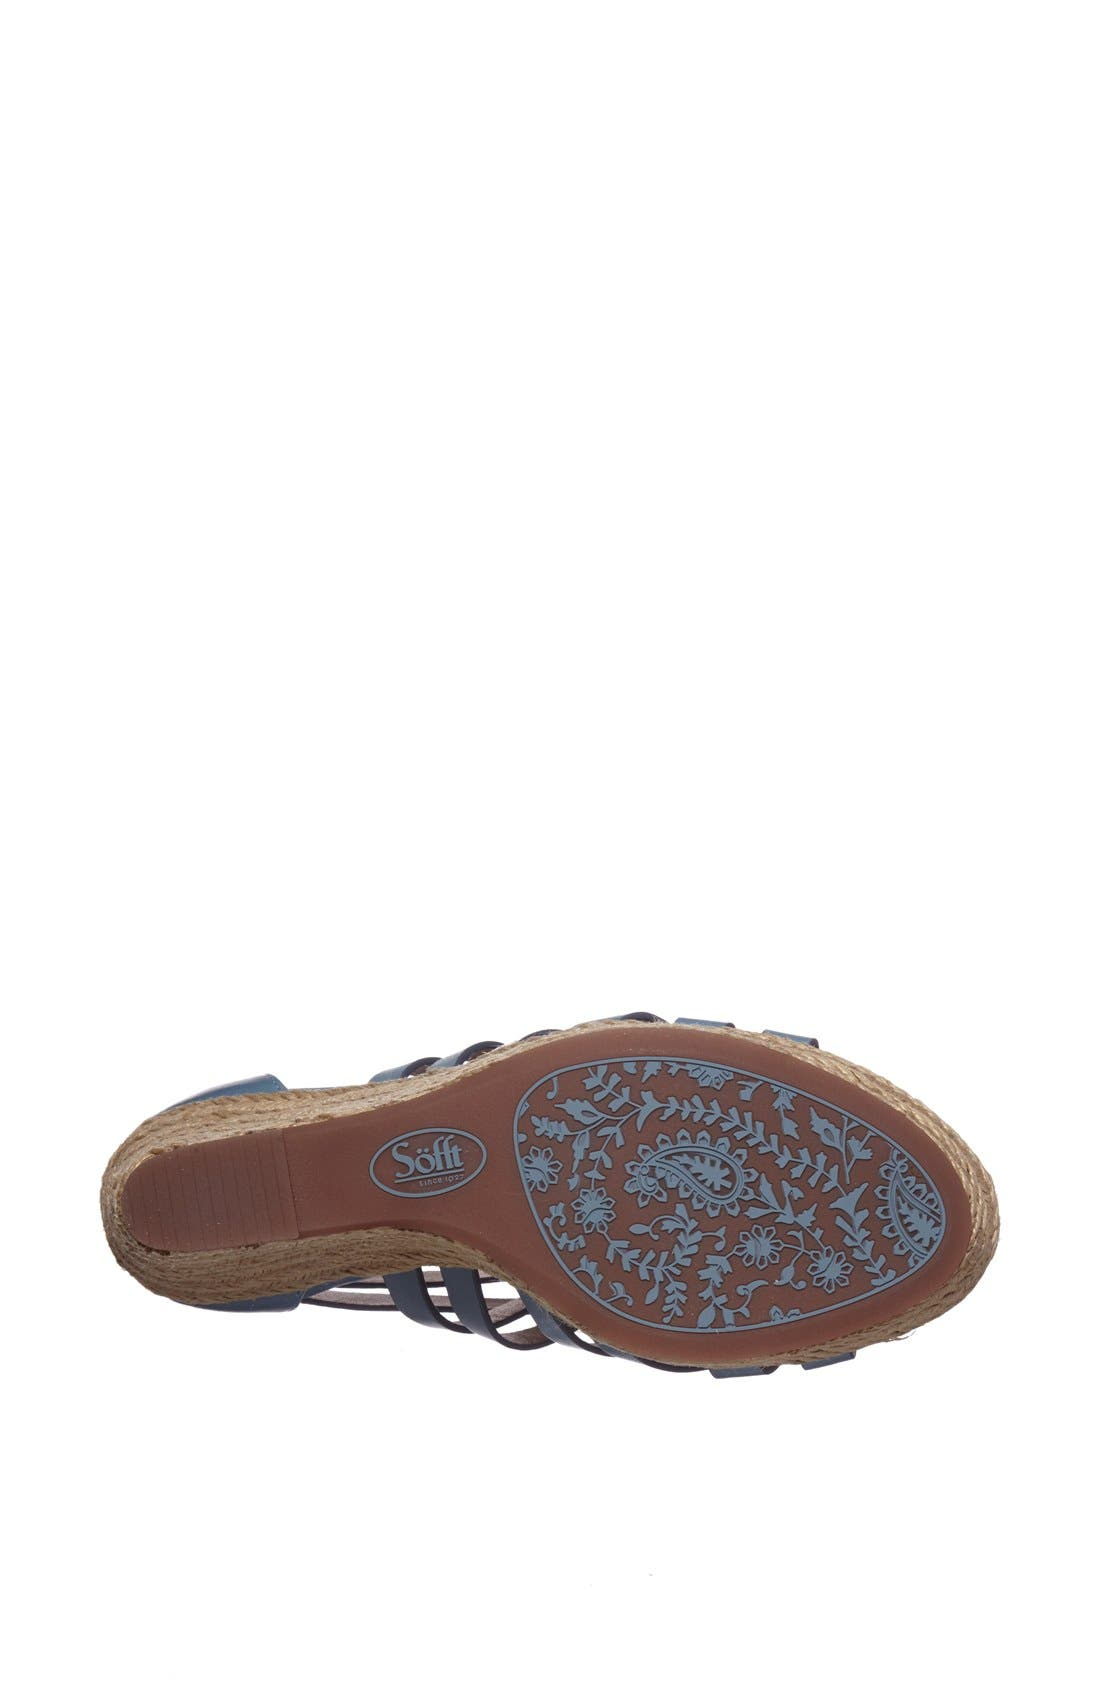 Alternate Image 4  - Söfft 'Priti' Wedge Sandal